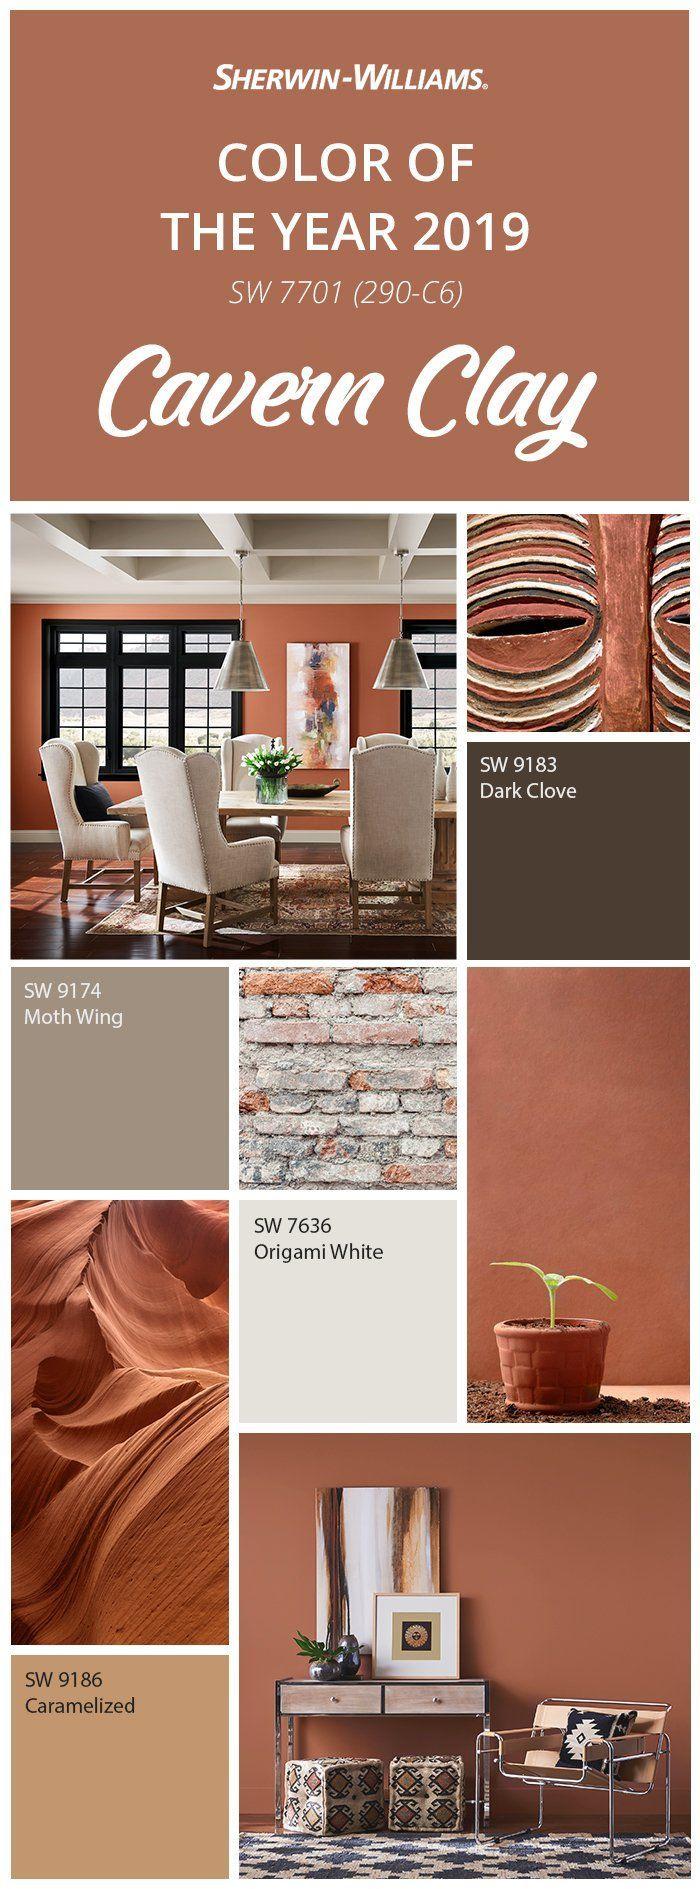 Erdtöne und endlose Horizonte  lernen Sie Sherwin-Williams 2019 Color kennen #livingroompaintcolorideas